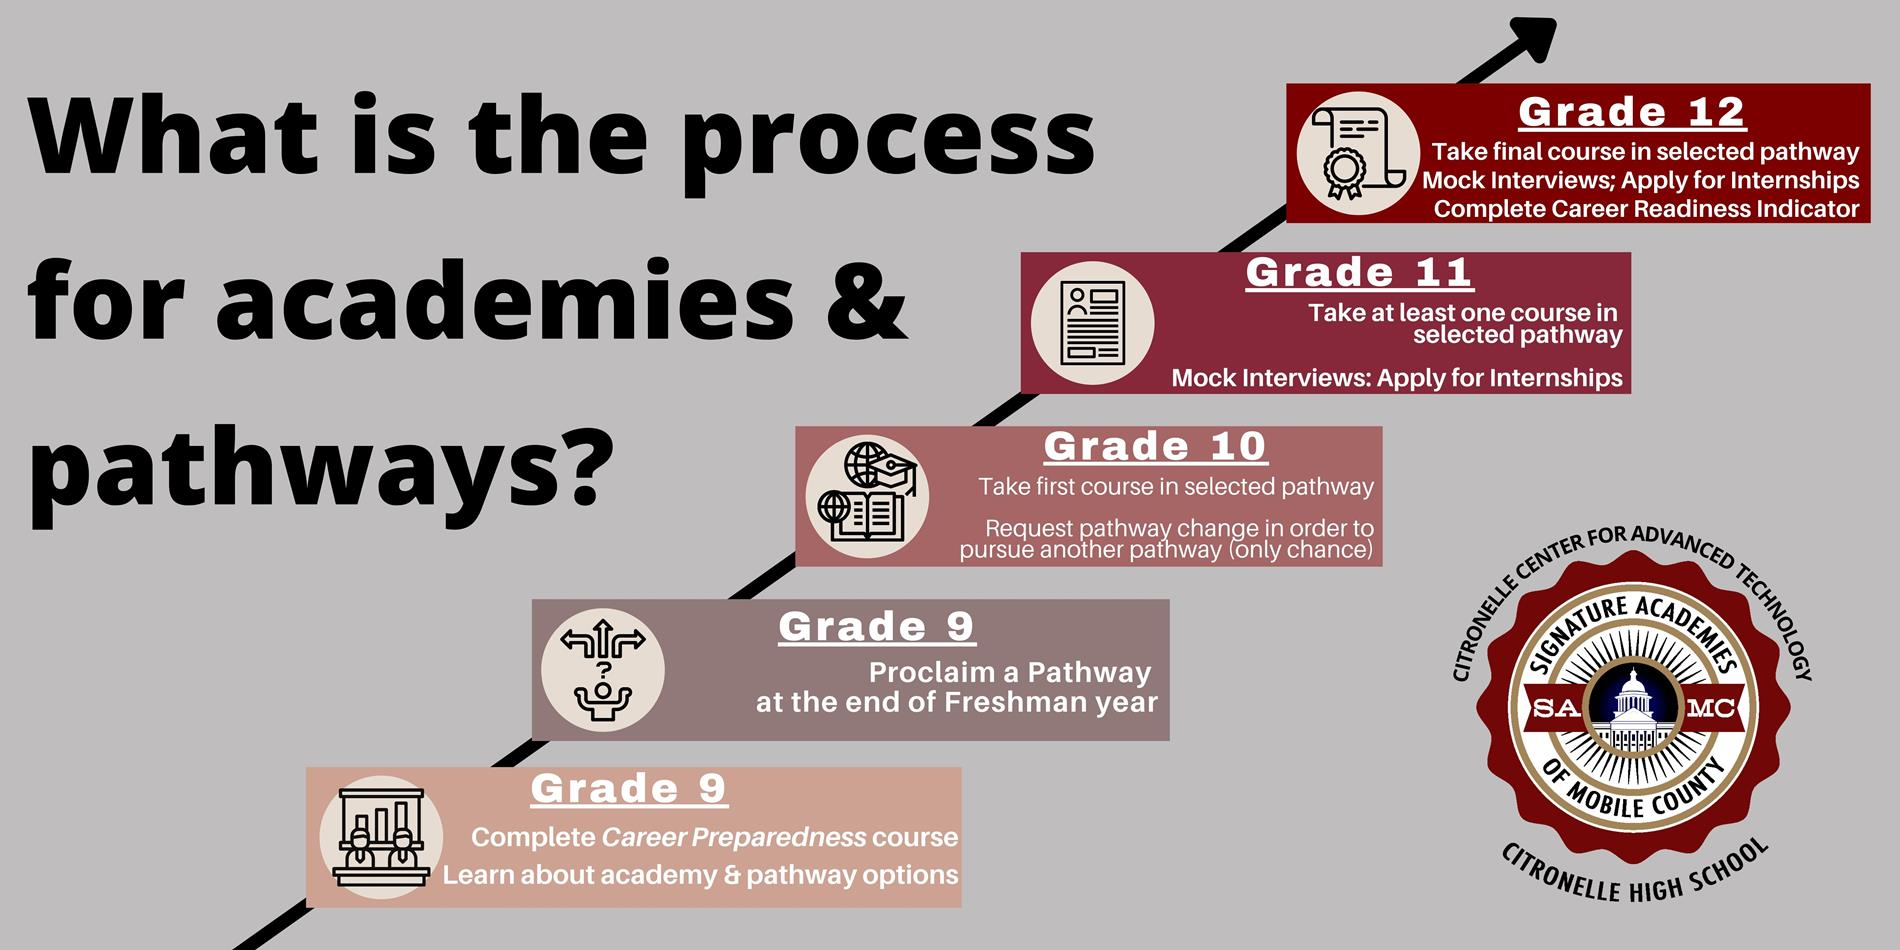 Academies and Pathways Process